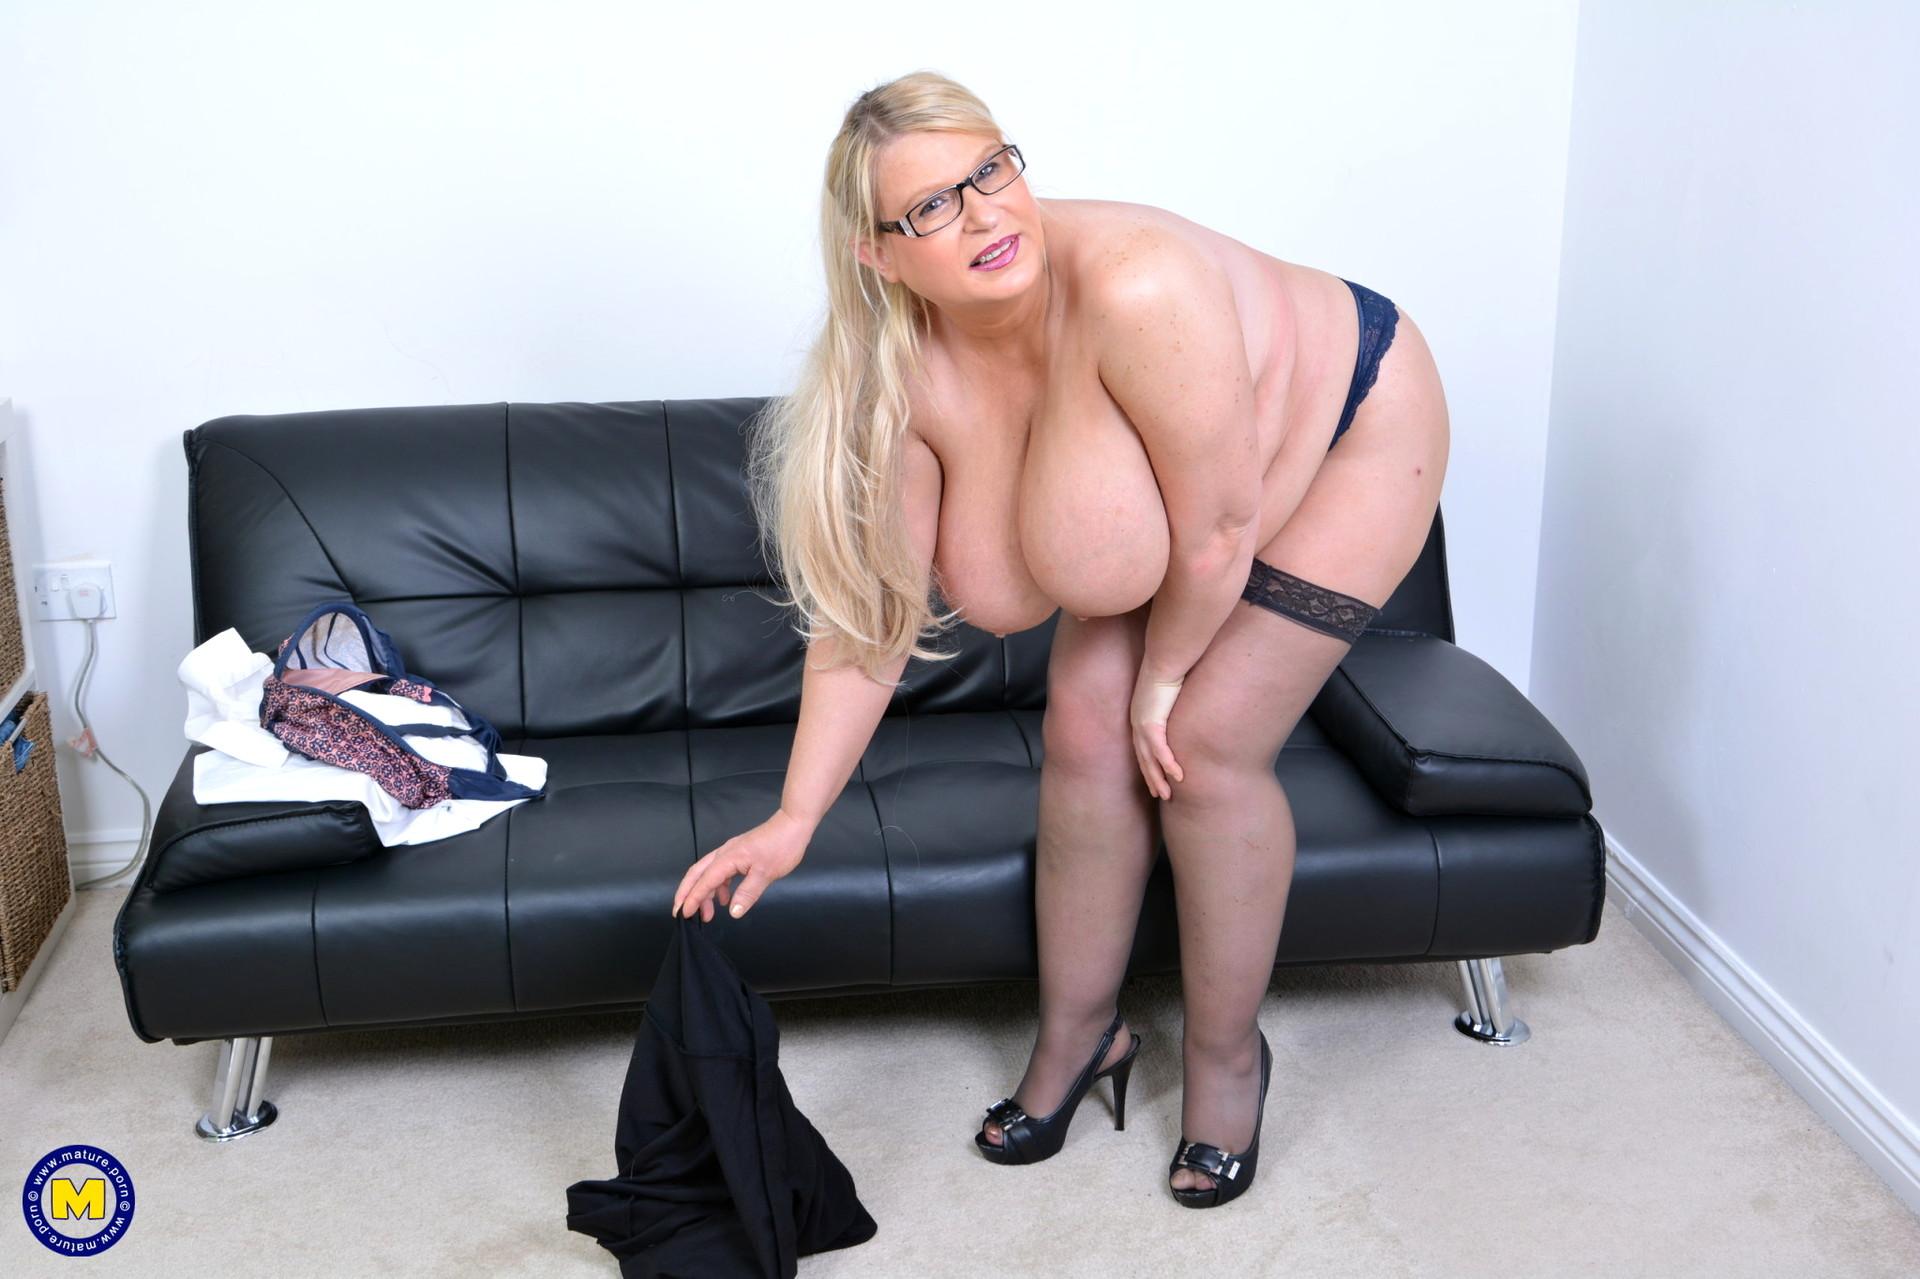 Bbw lacey mature nl, sarah roemer sexy hot